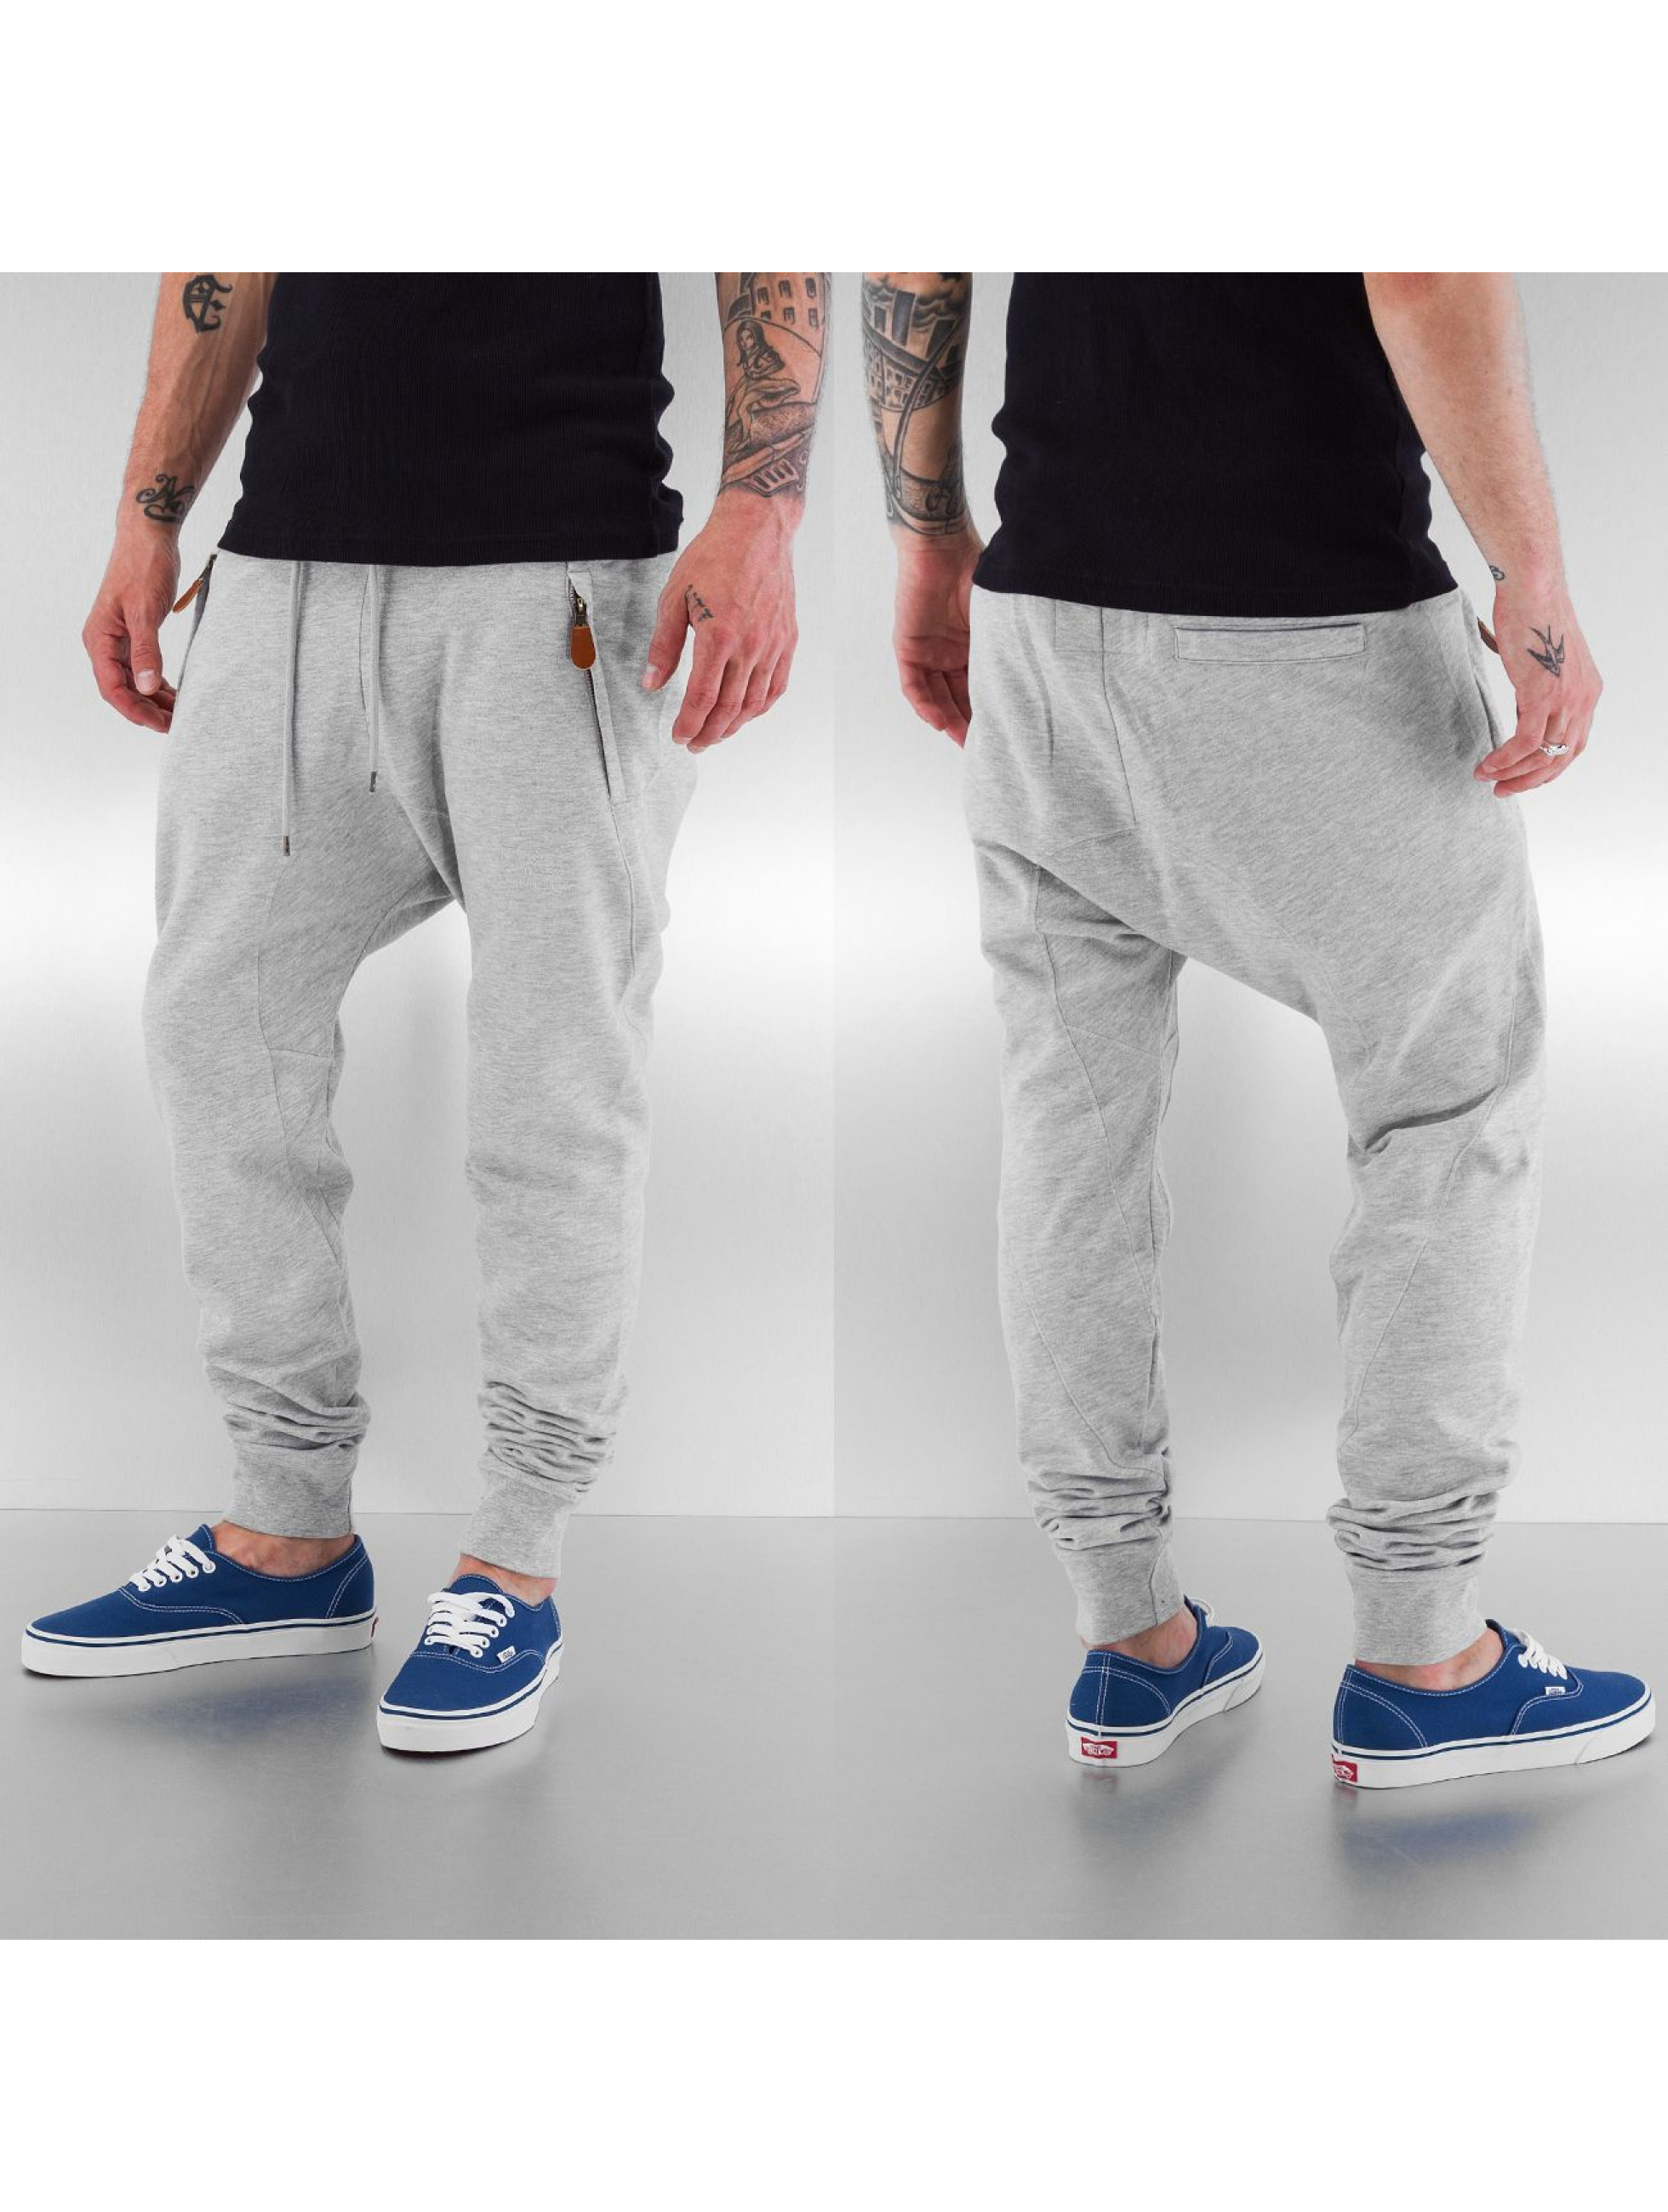 jogging adidas slim